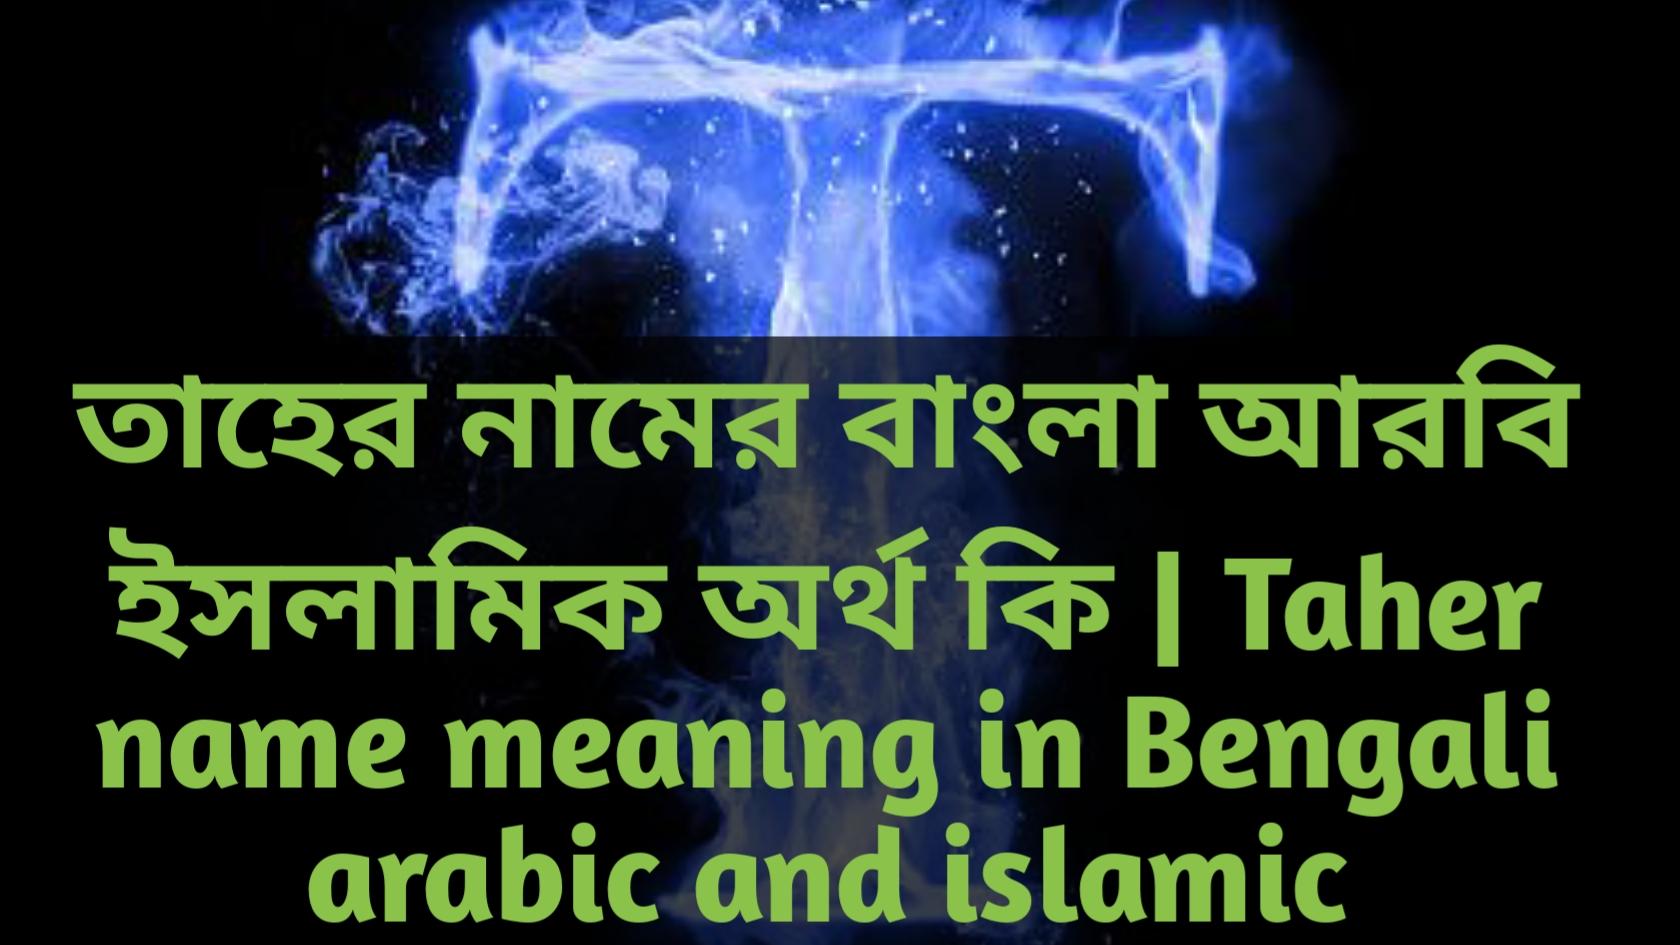 Taher name meaning in Bengali, তাহের নামের অর্থ কি, তাহের নামের বাংলা অর্থ কি, তাহের নামের ইসলামিক অর্থ কি,